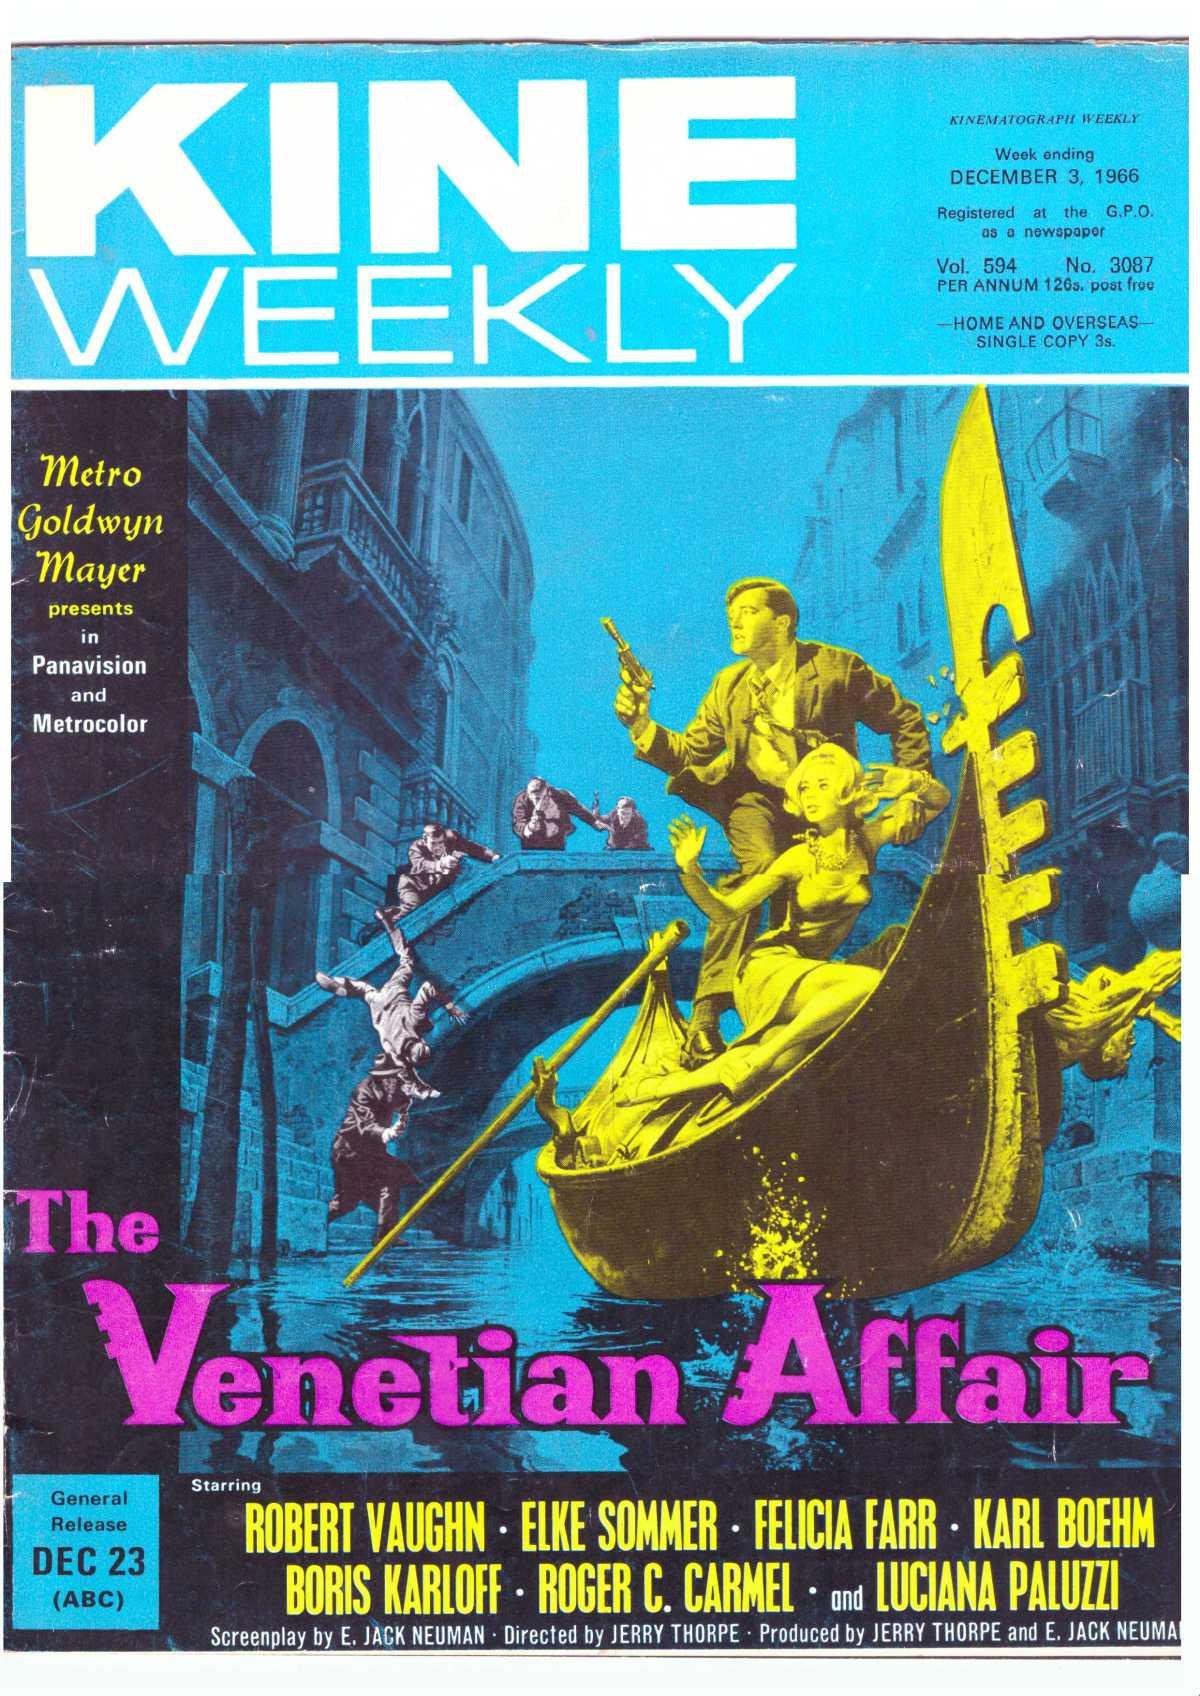 The Venetian Affair (1966)****